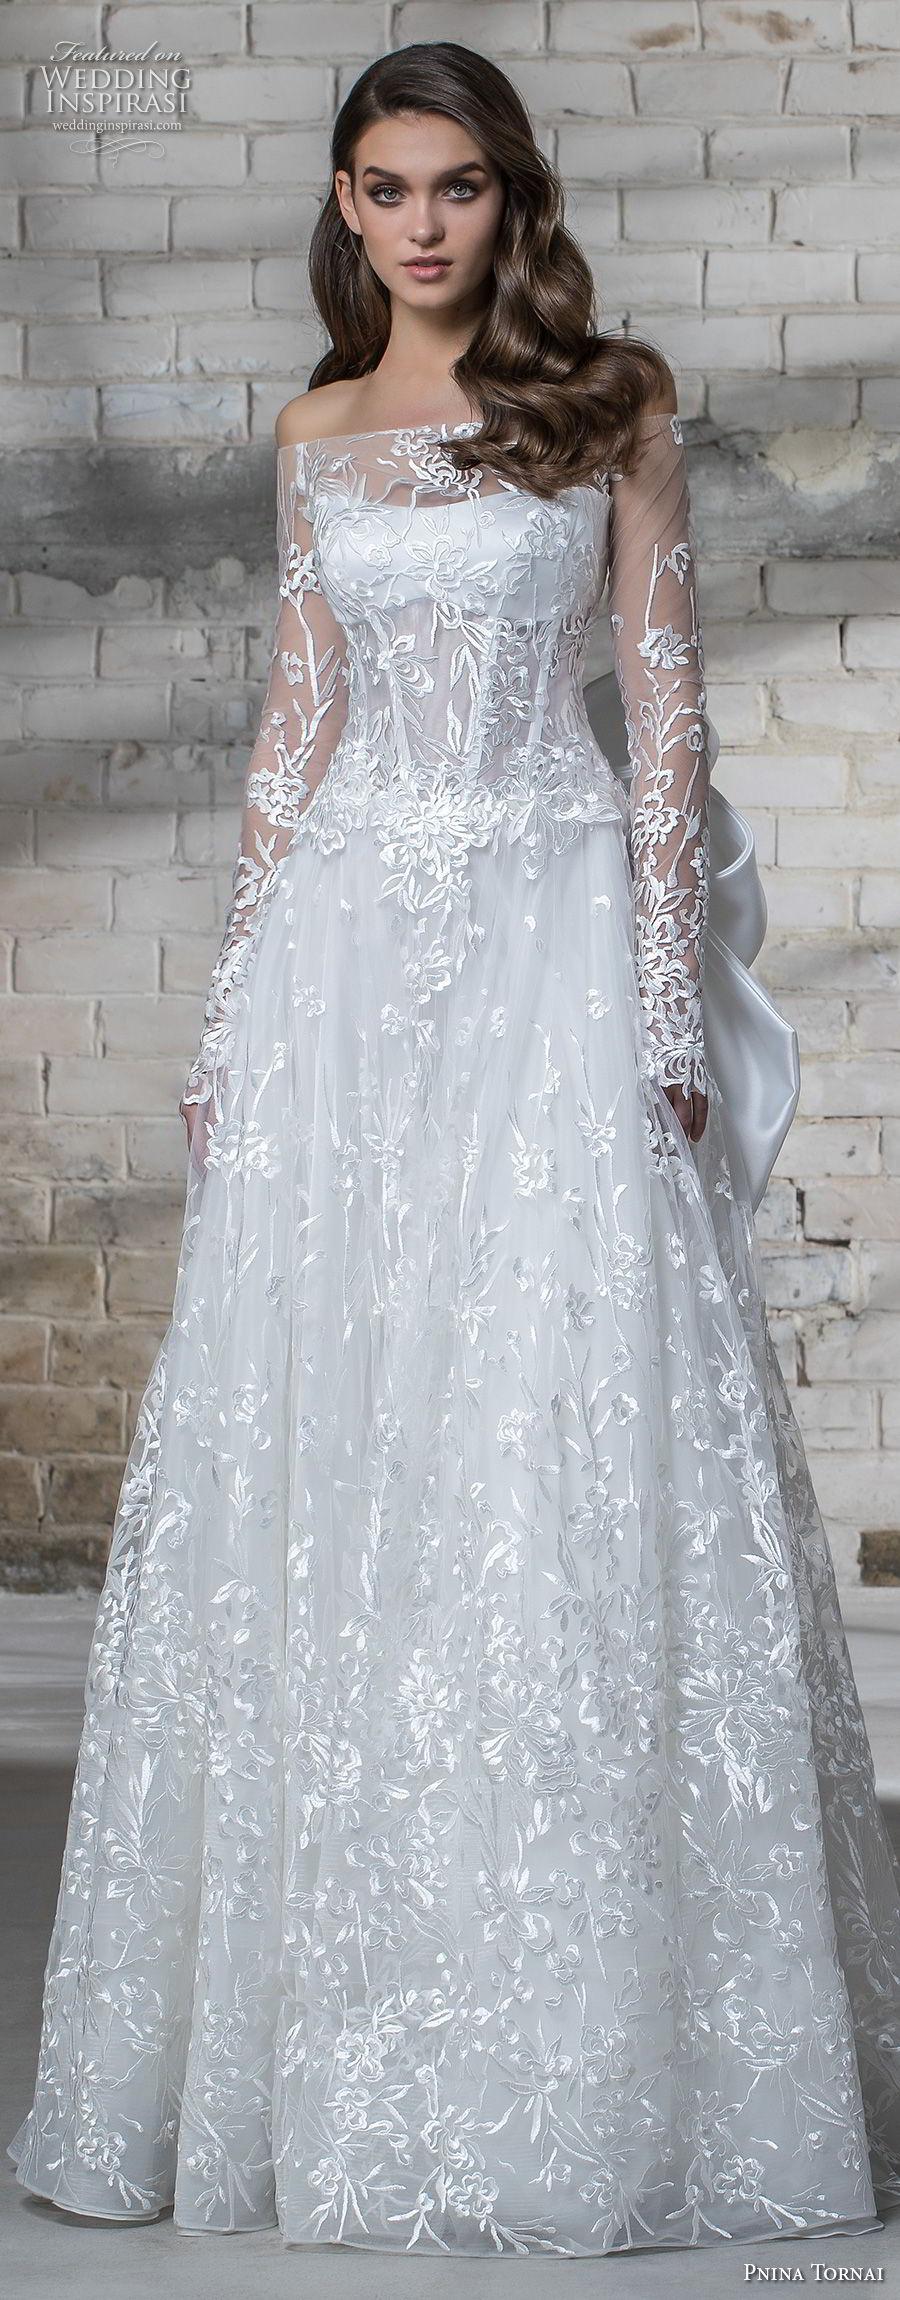 Pnina Tornai Kleinfeld Wedding Dresses